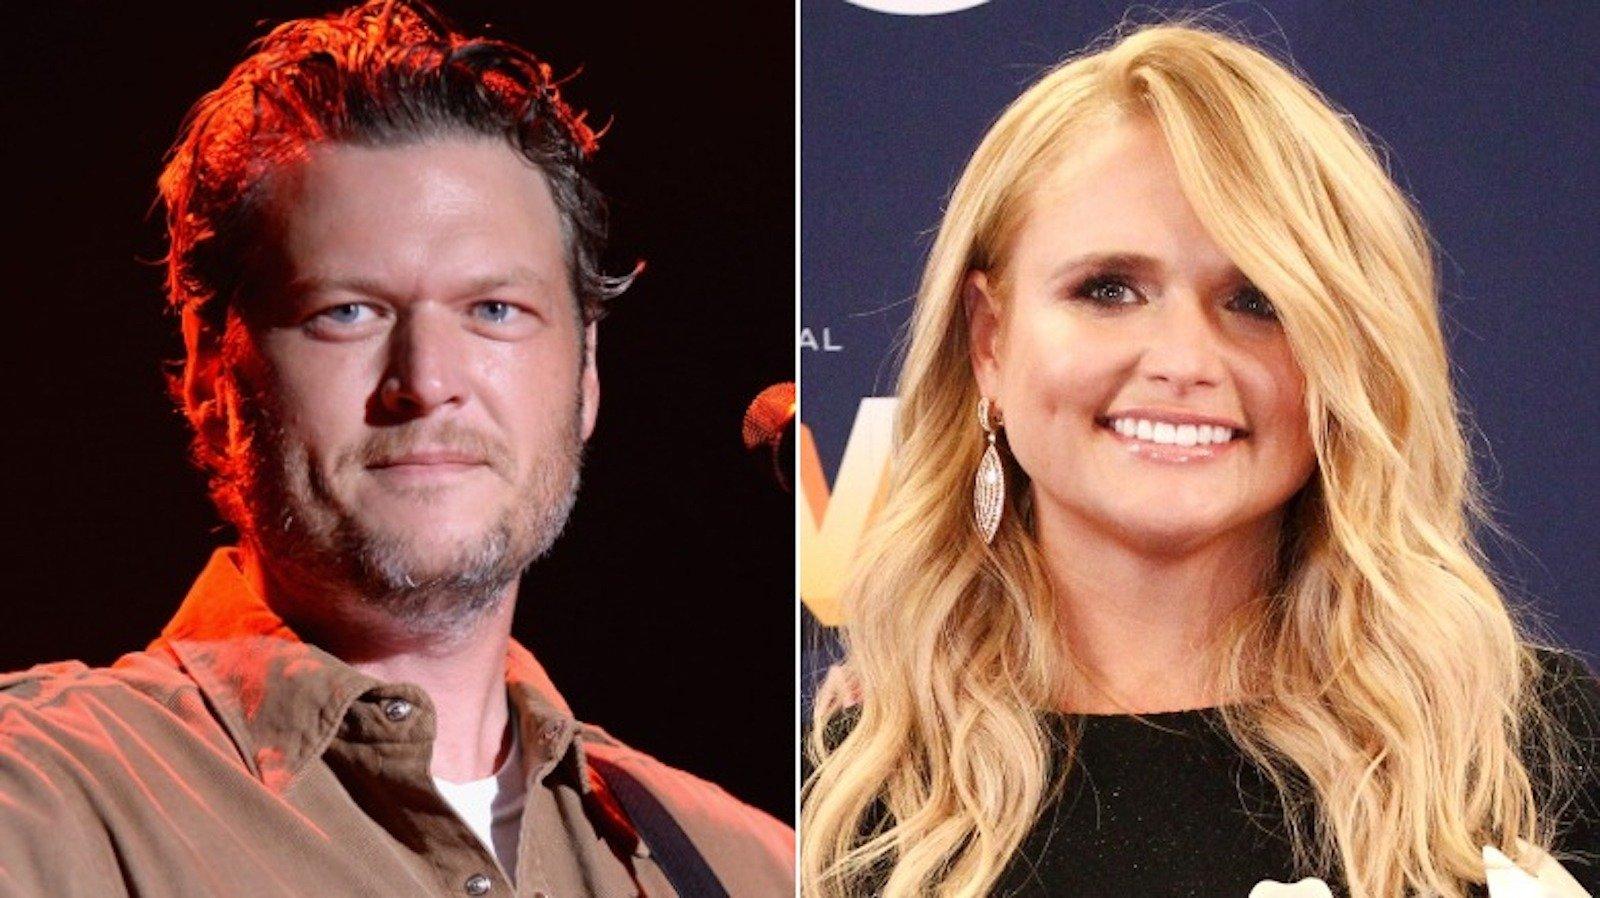 Miranda Lambert Or Blake Shelton: Who Makes More Money?